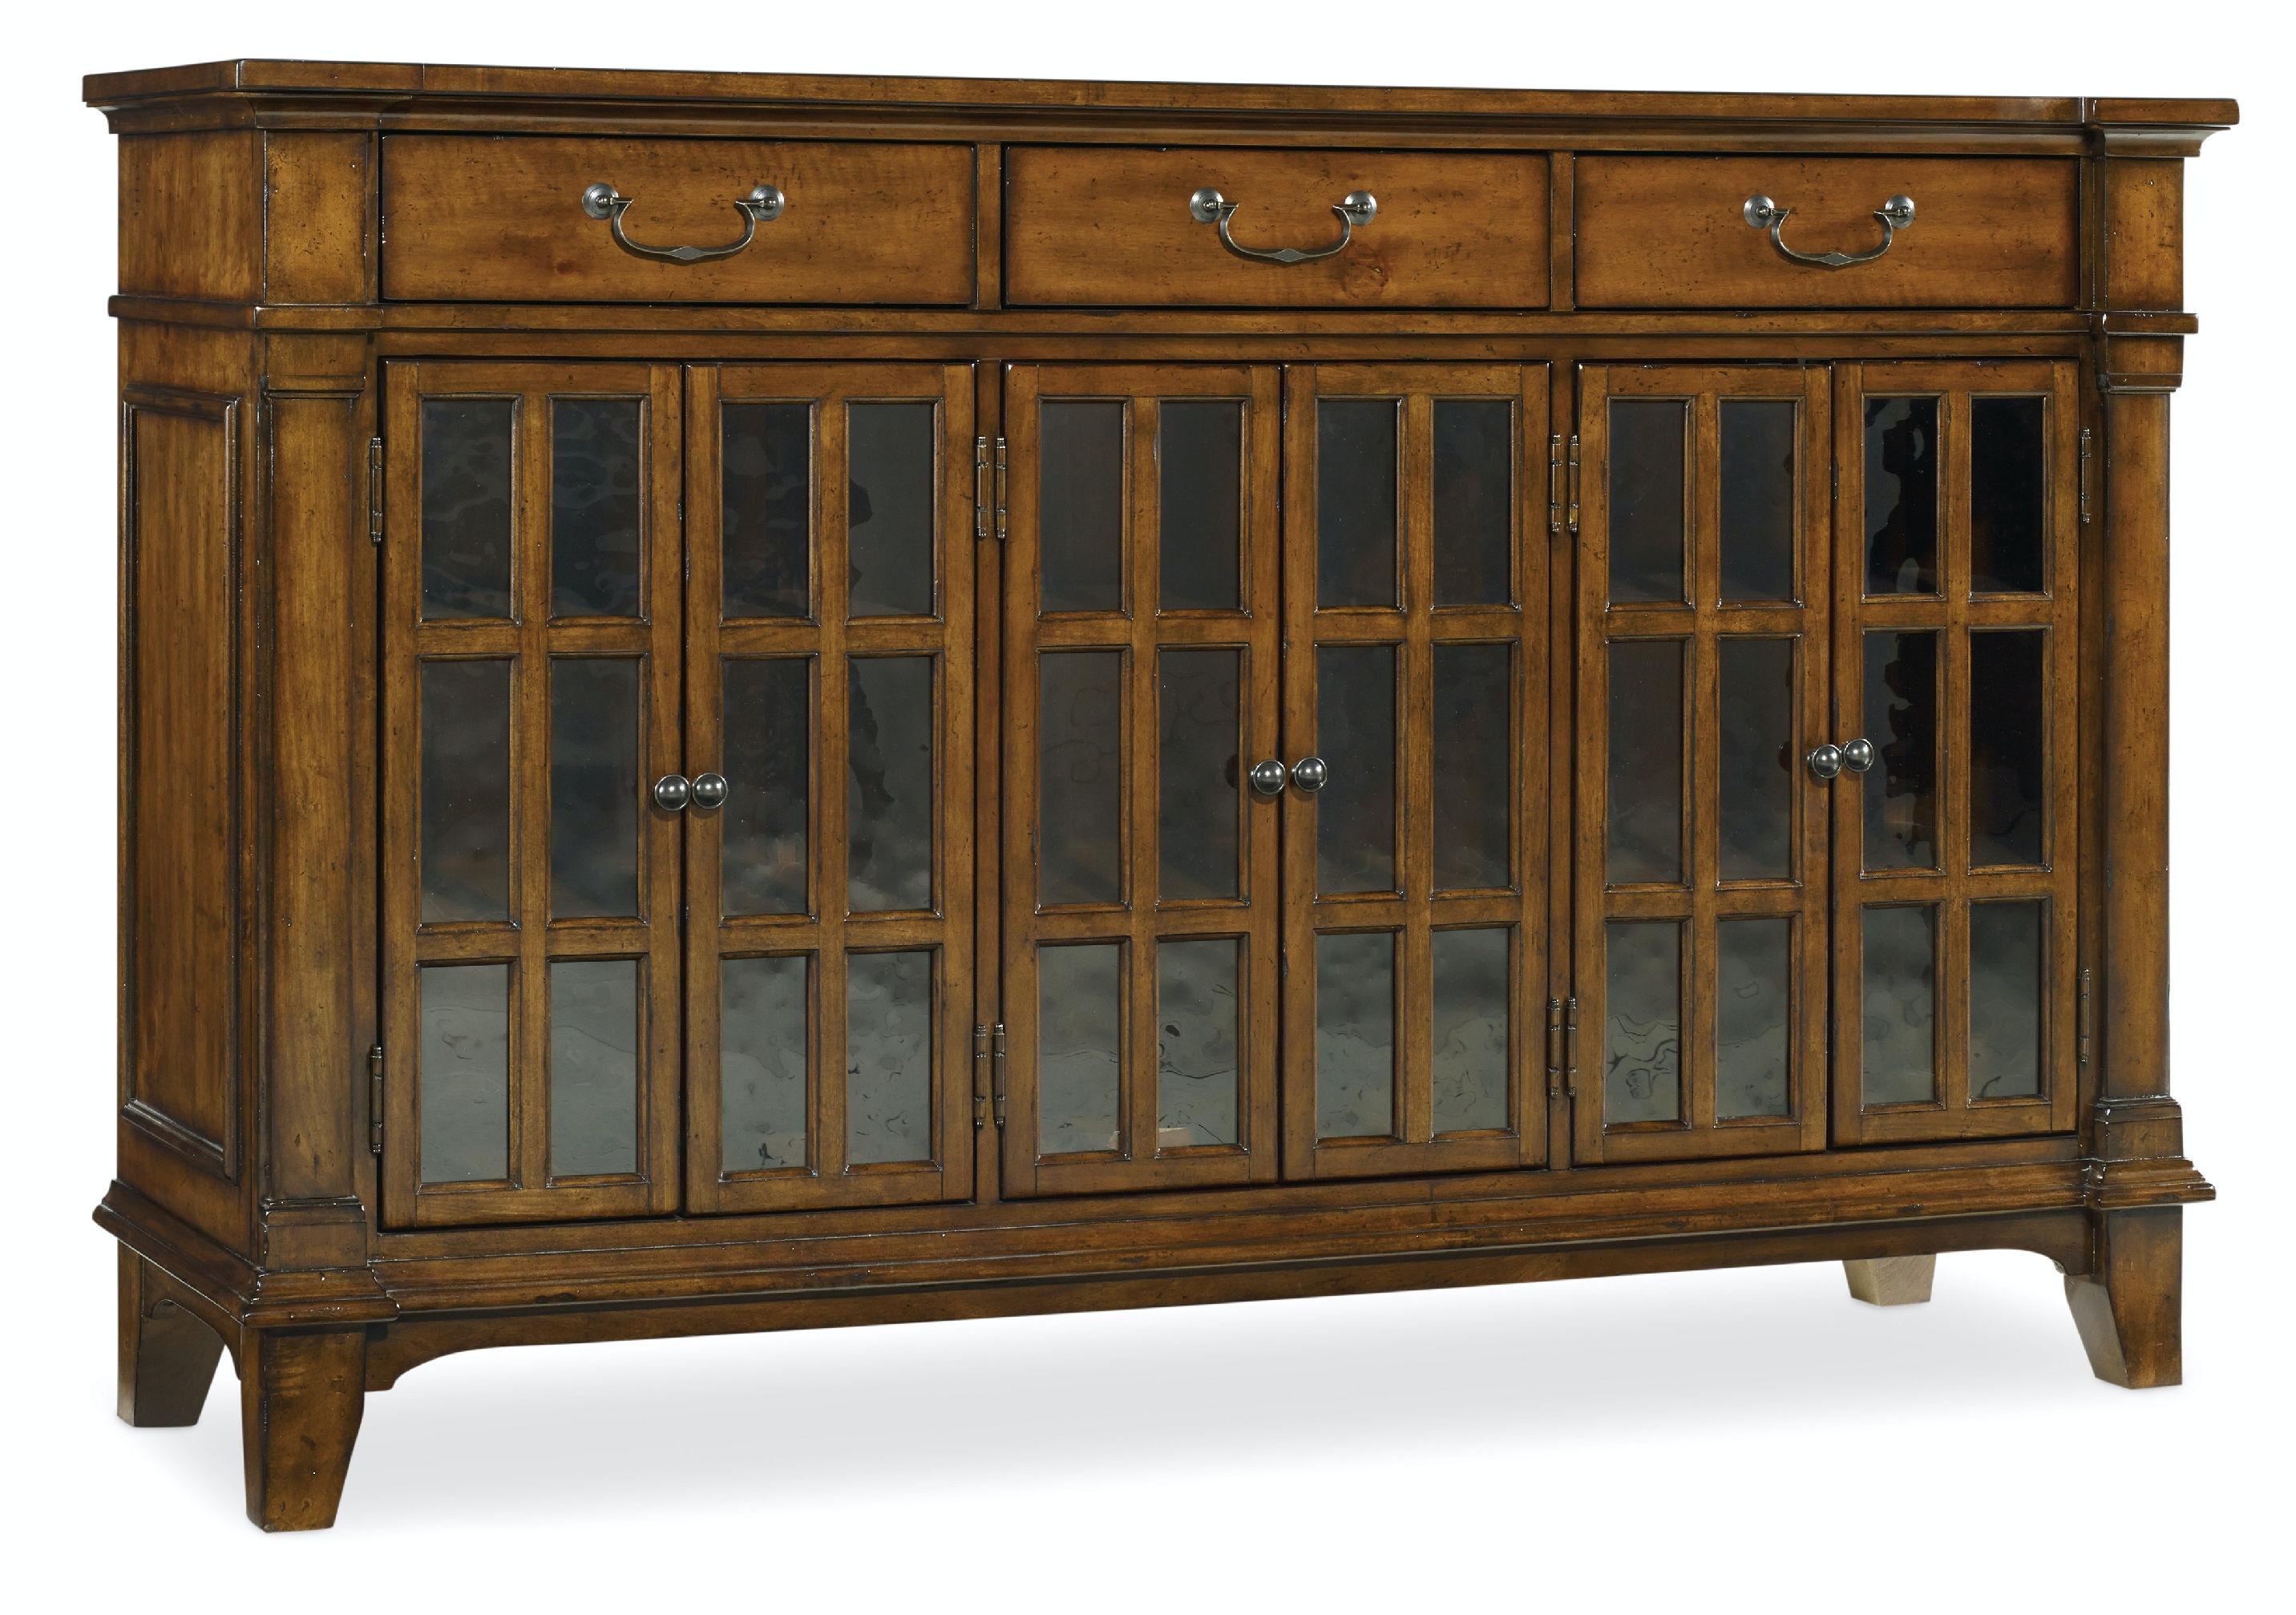 Hooker Furniture Dining Room Tynecastle Buffet 5323 75900